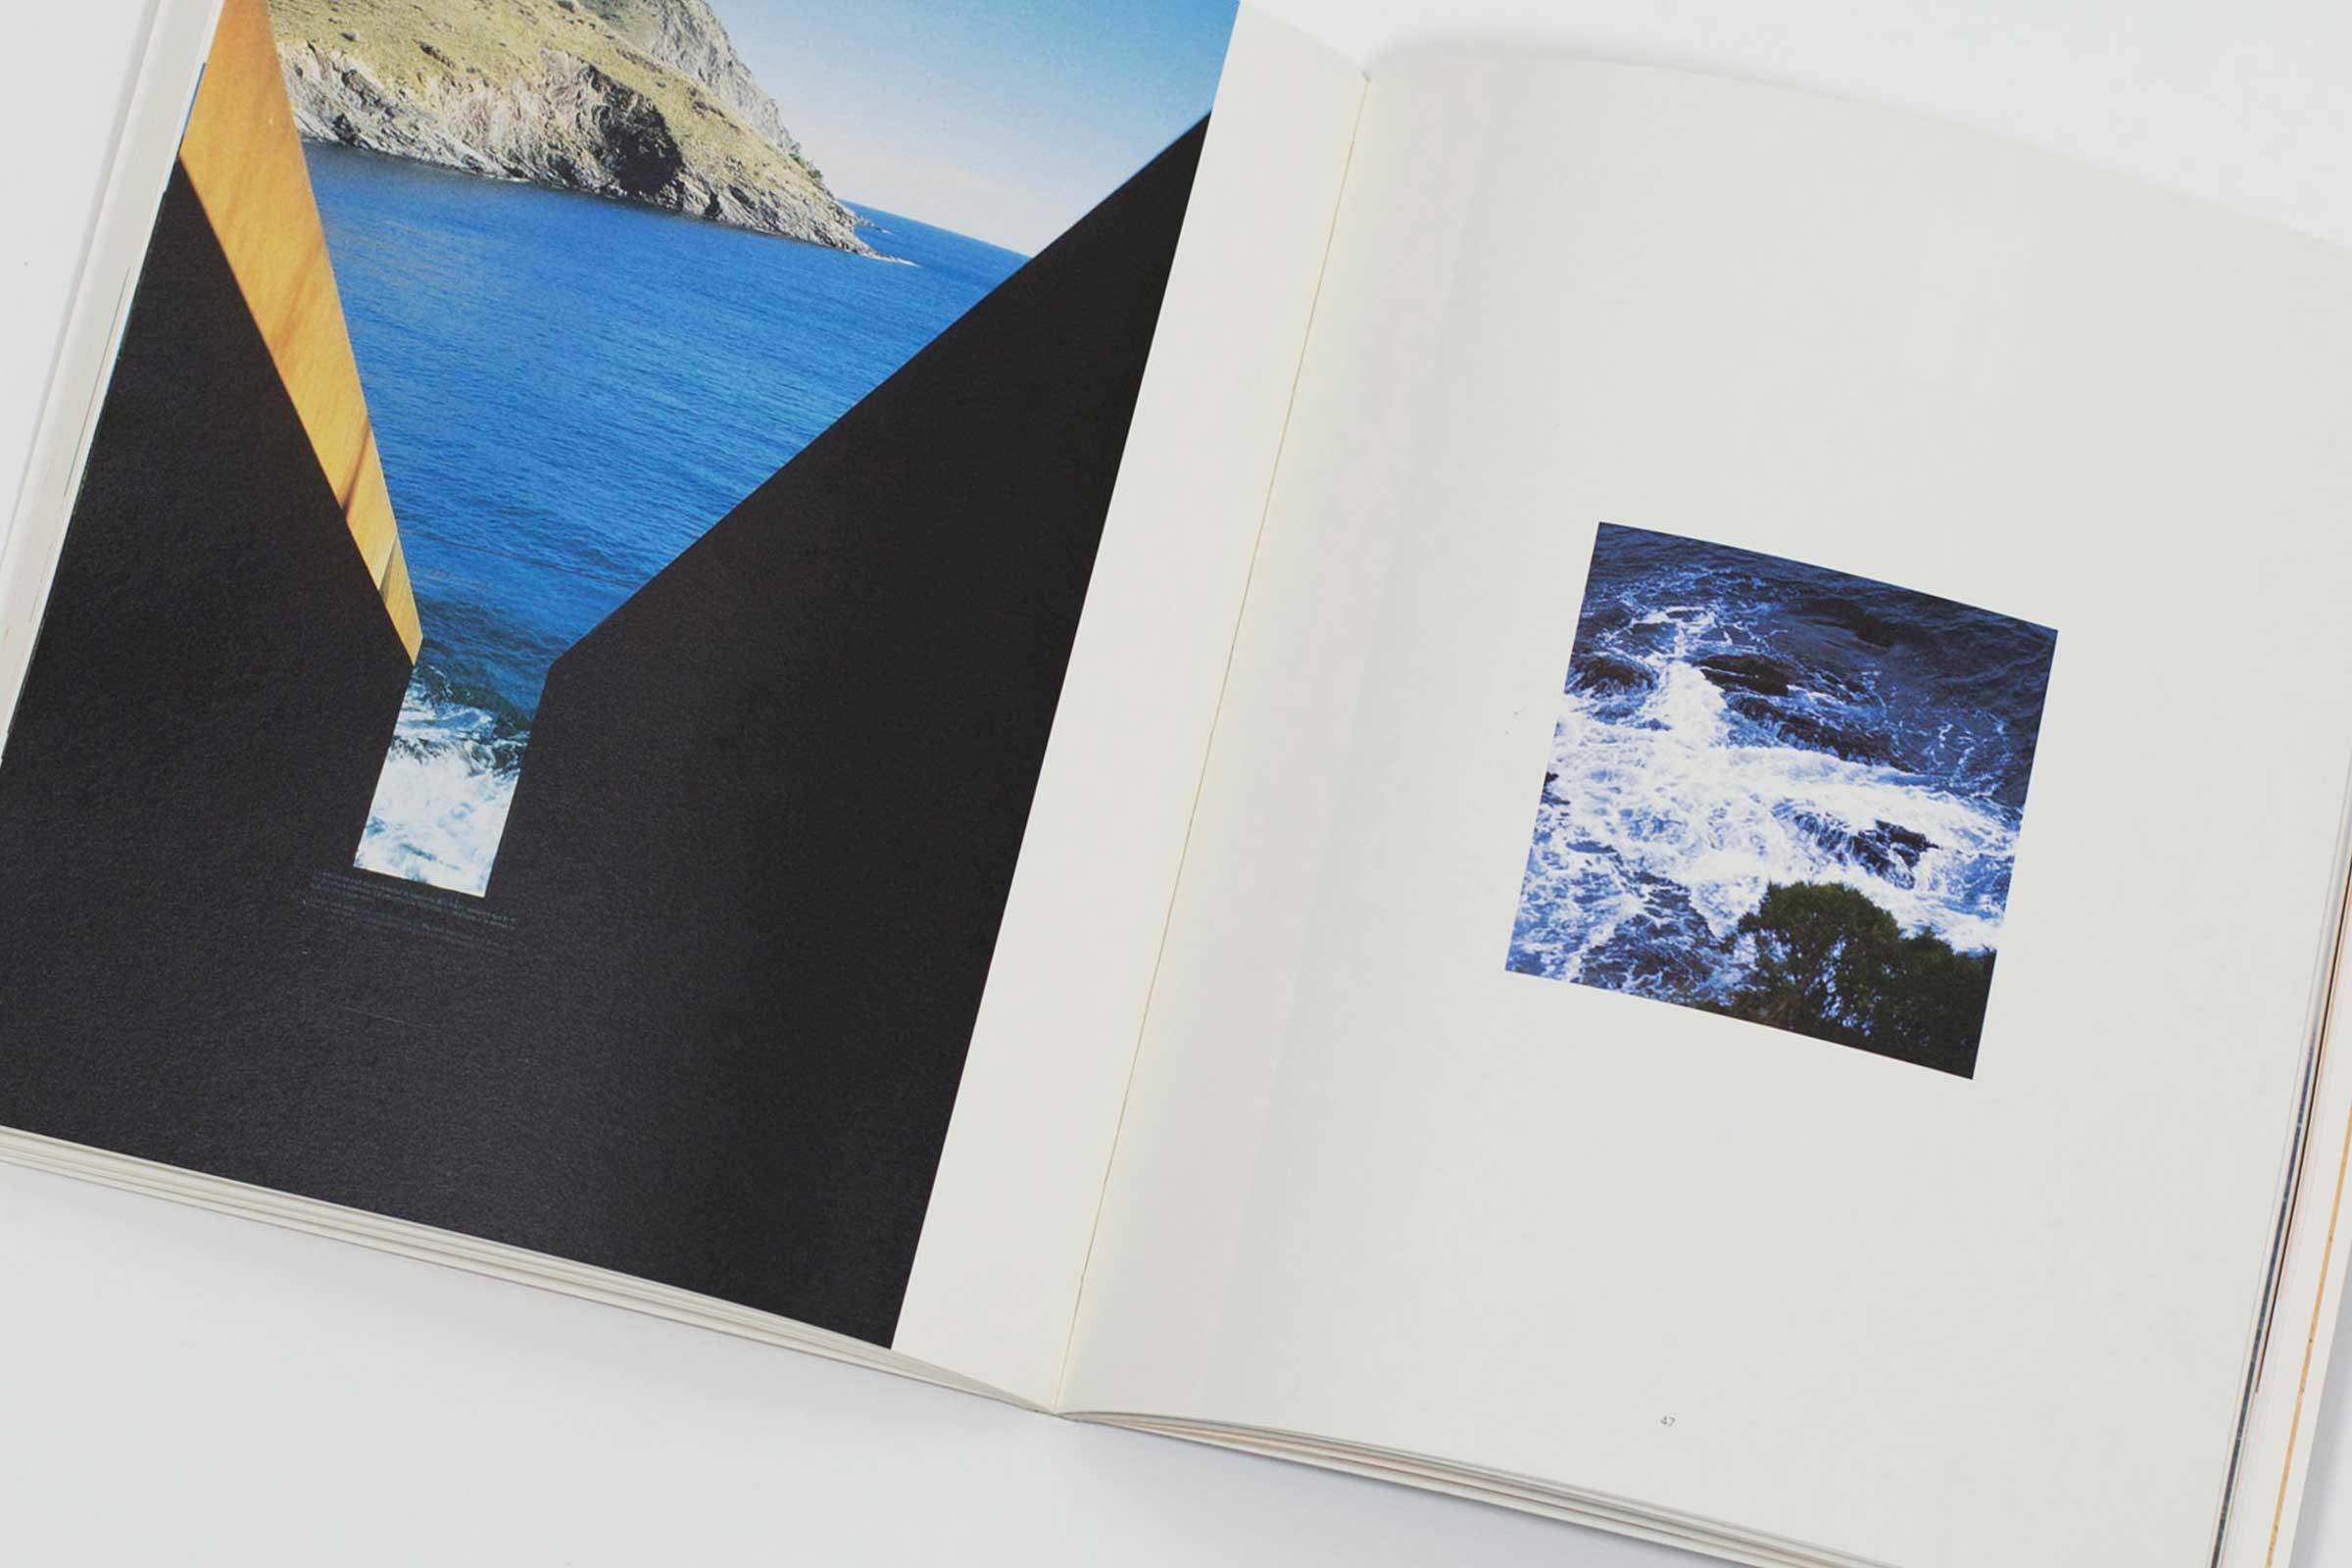 dani karavan catalogue 2015 jeanne bucher jaeger. Black Bedroom Furniture Sets. Home Design Ideas